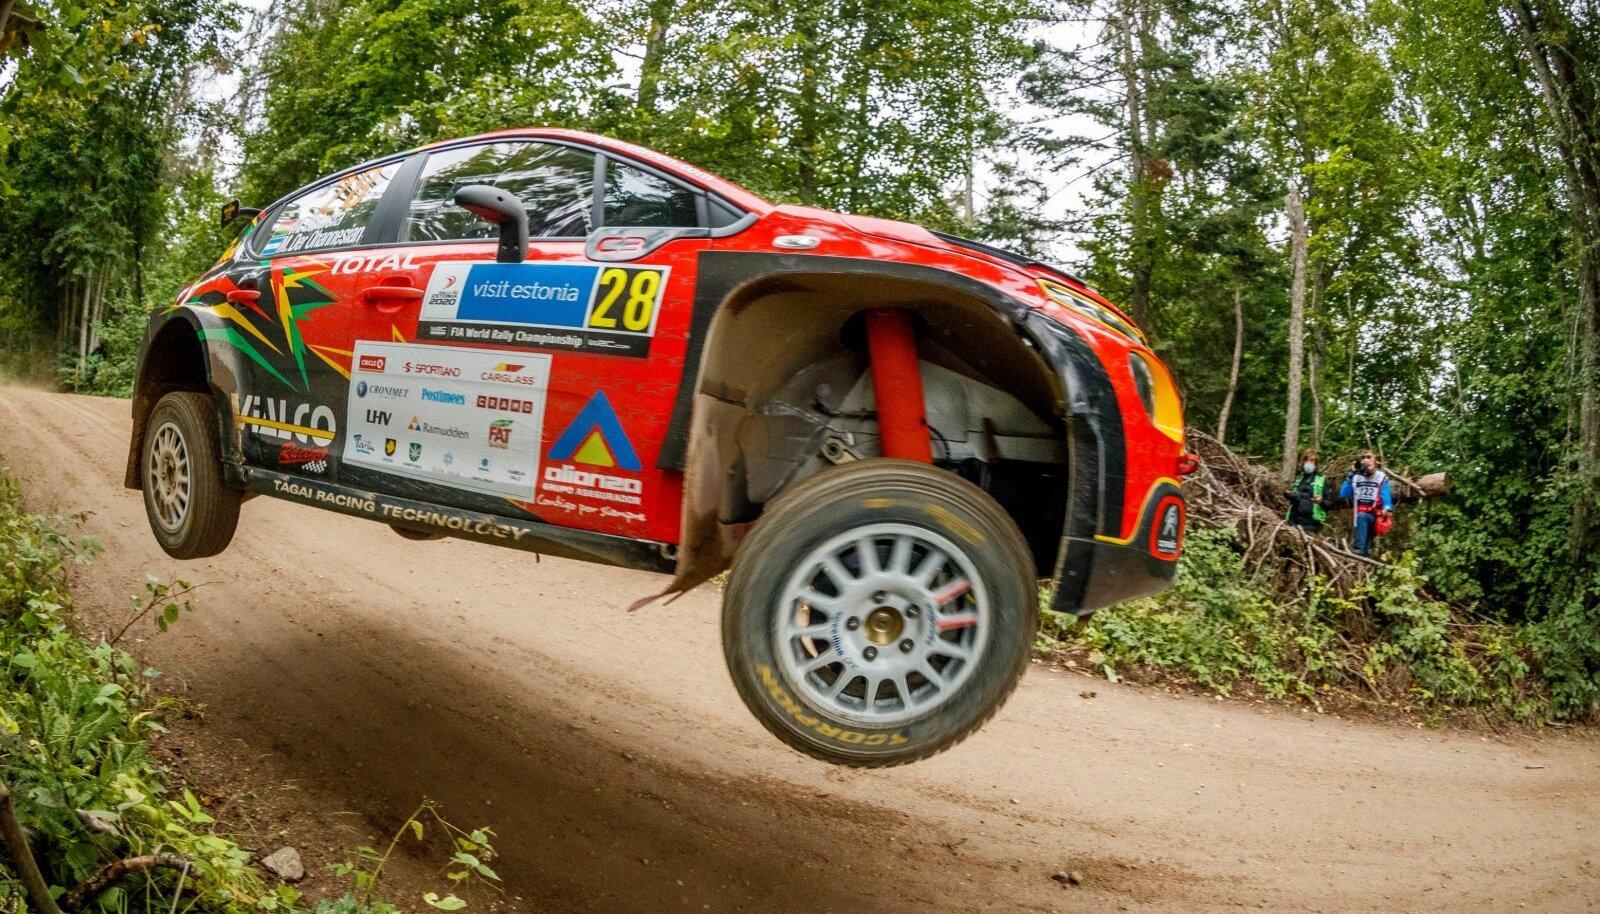 WRC RALLY ESTONIA 2020